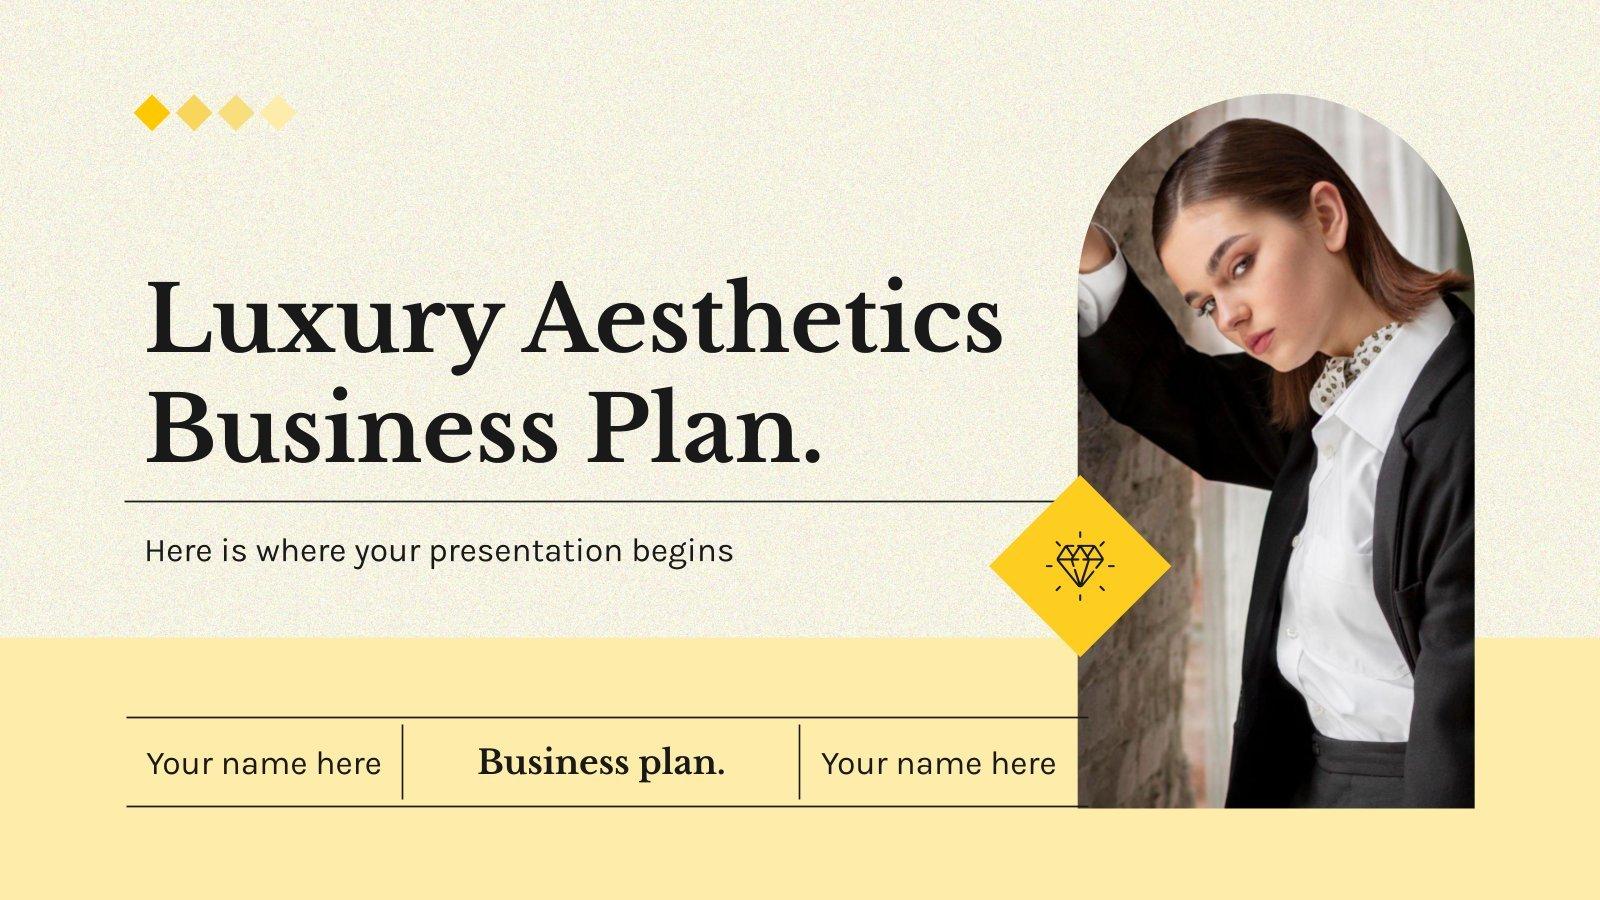 Luxury Aesthetics Business Plan presentation template